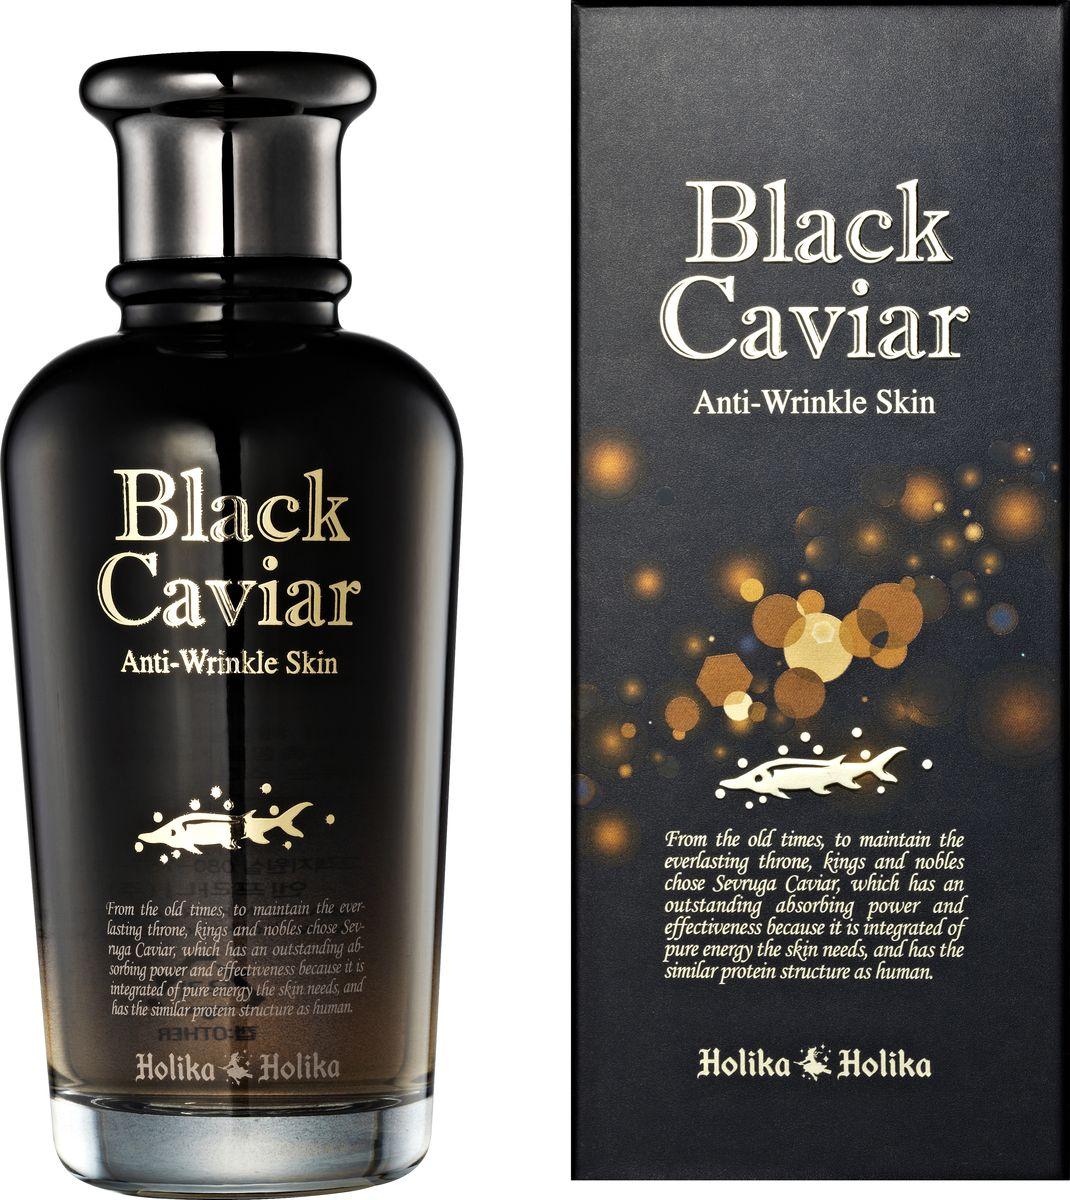 Holika Holika Питательный лифтинг тоник Черная икра, 120 мл black caviar antiwrinkle skin питательный лифтинг тонер черная икра 120 мл холика холика